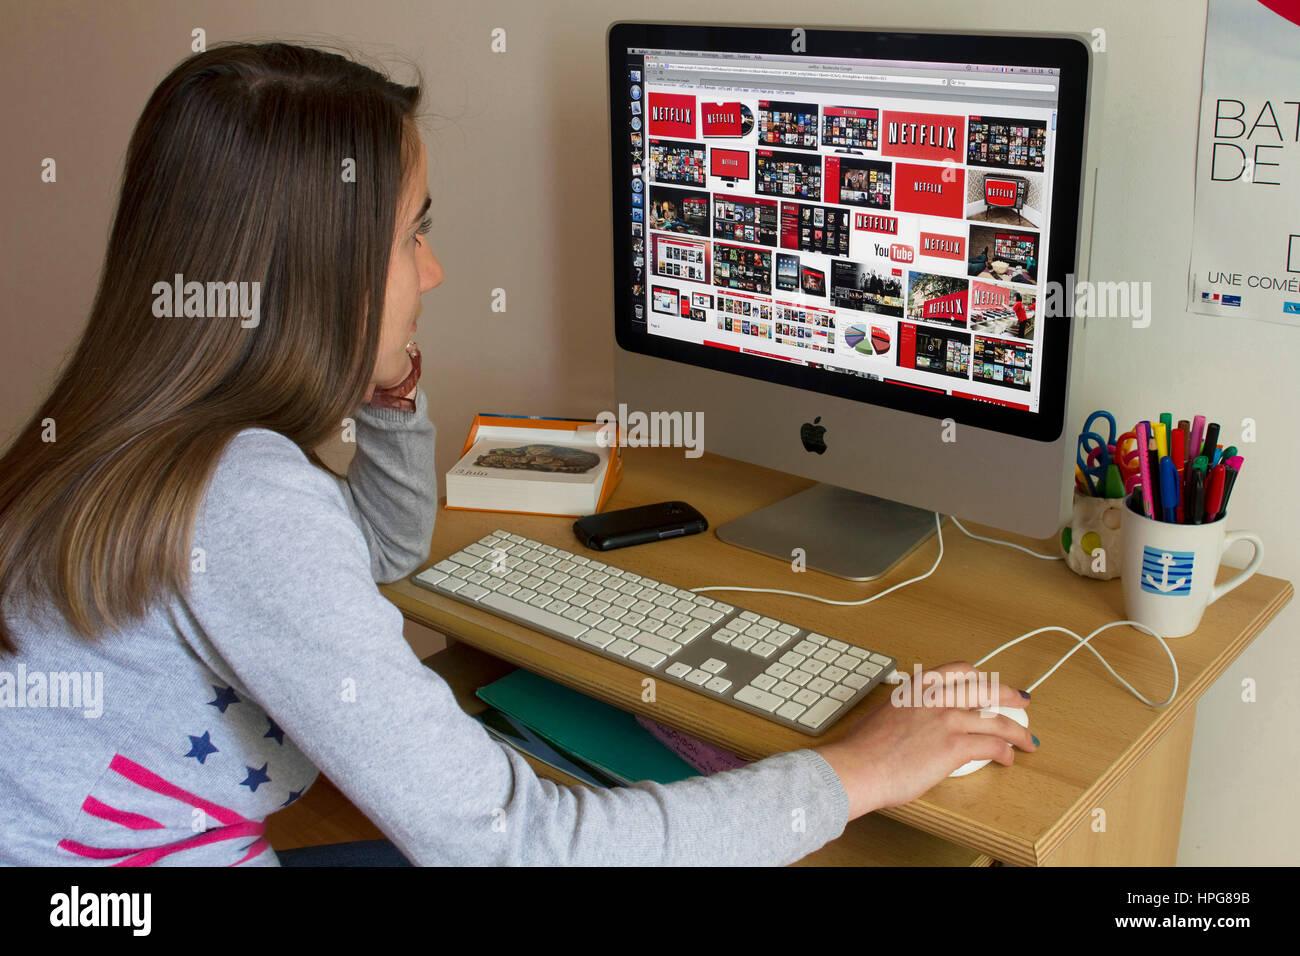 Colegiala en frente de una pantalla de ordenador mostrar Netflix. Imagen De Stock